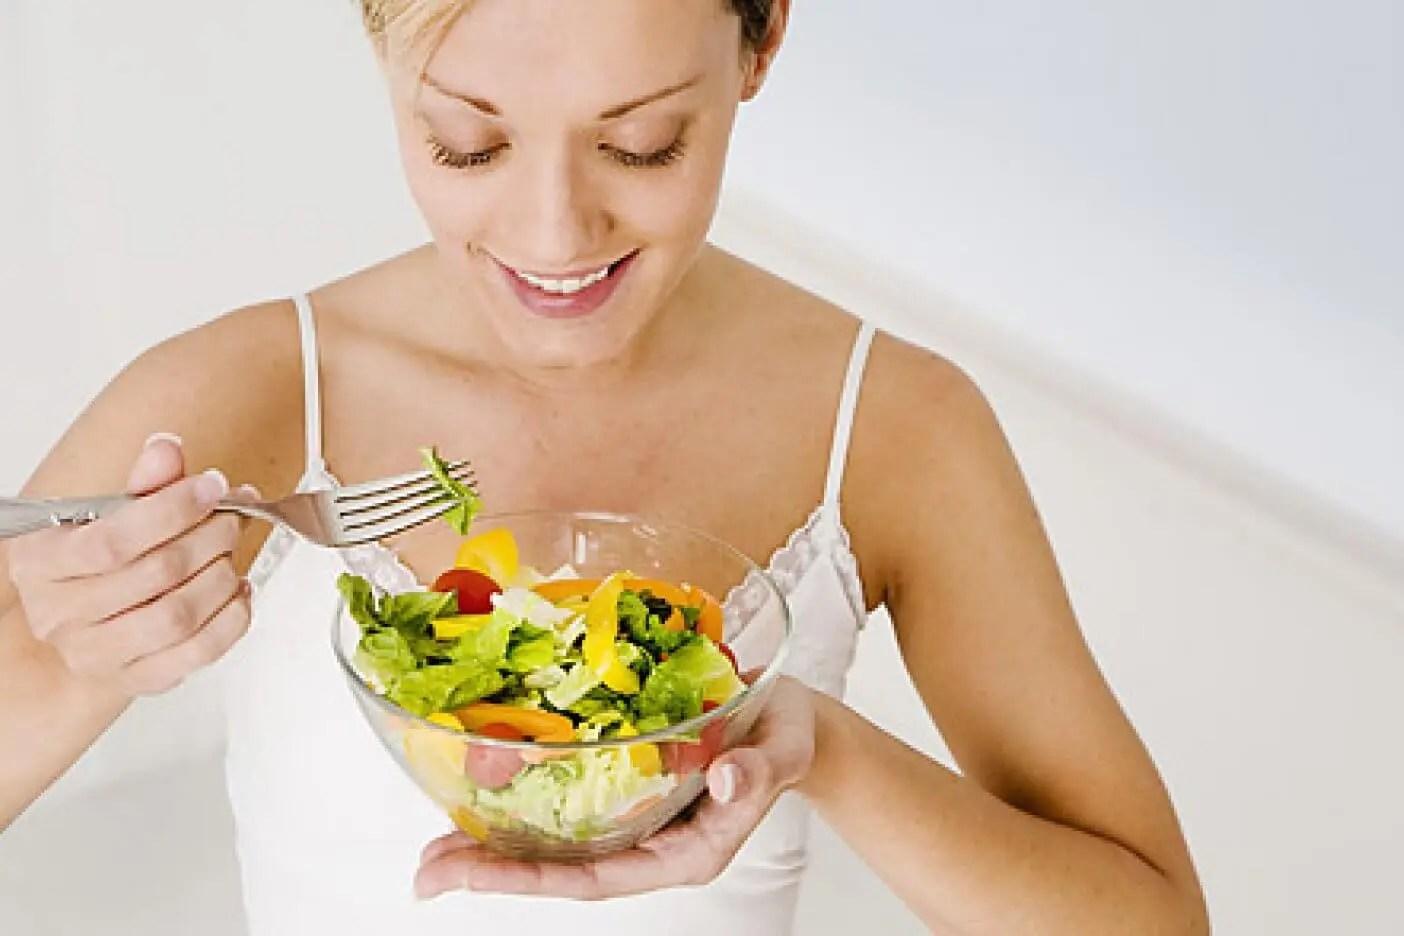 dieta baja en índice glucémico